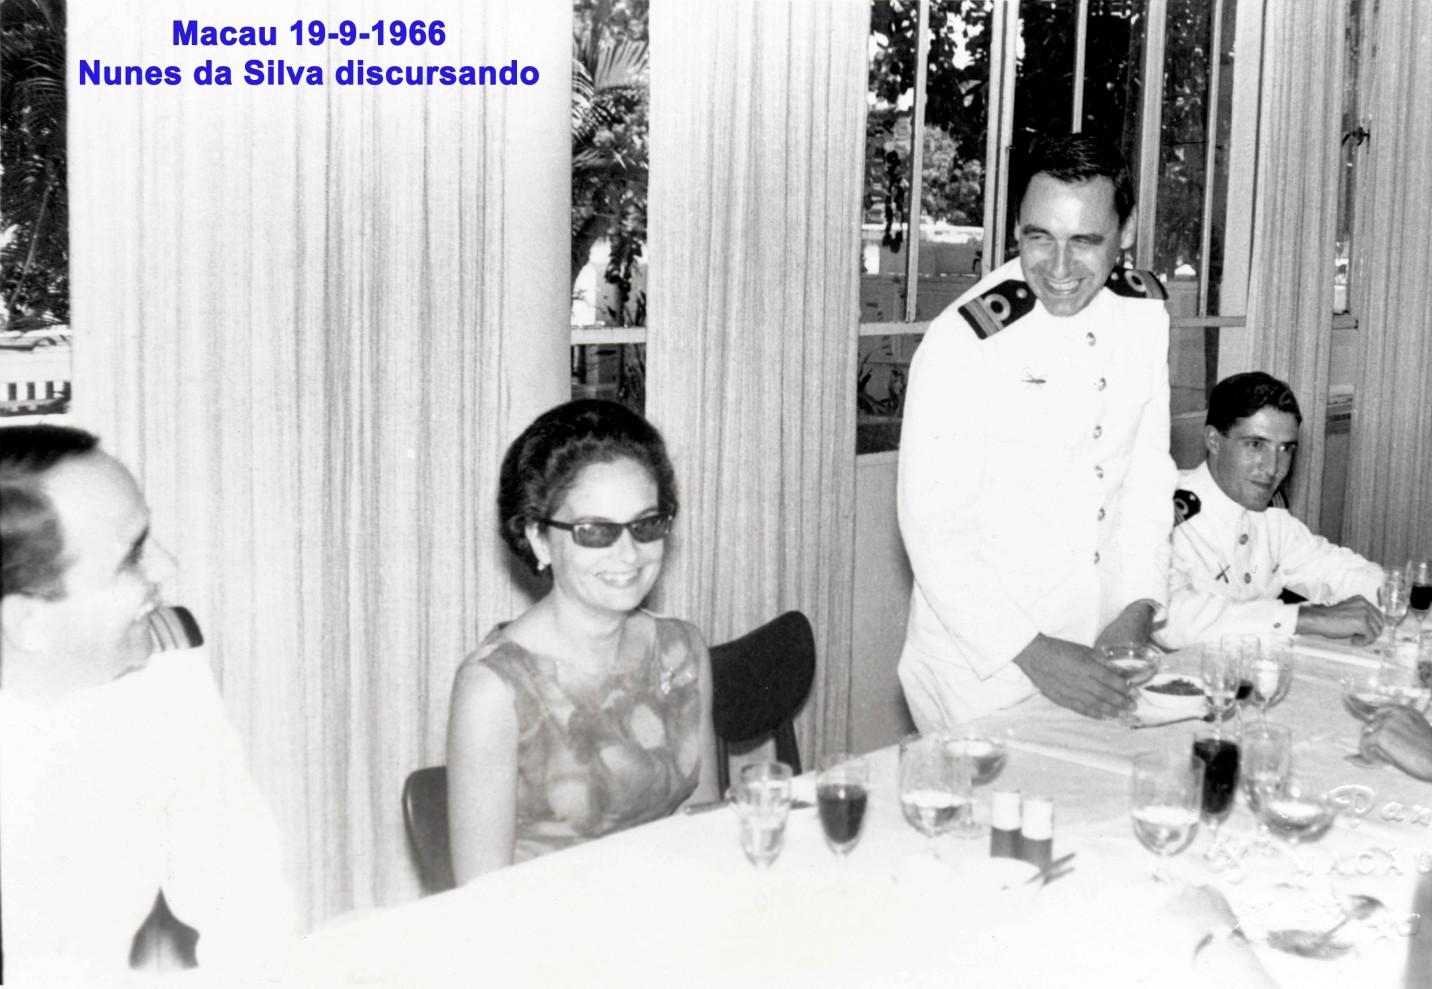 017 66-09-19 Nunes da Silva discursa no jantar